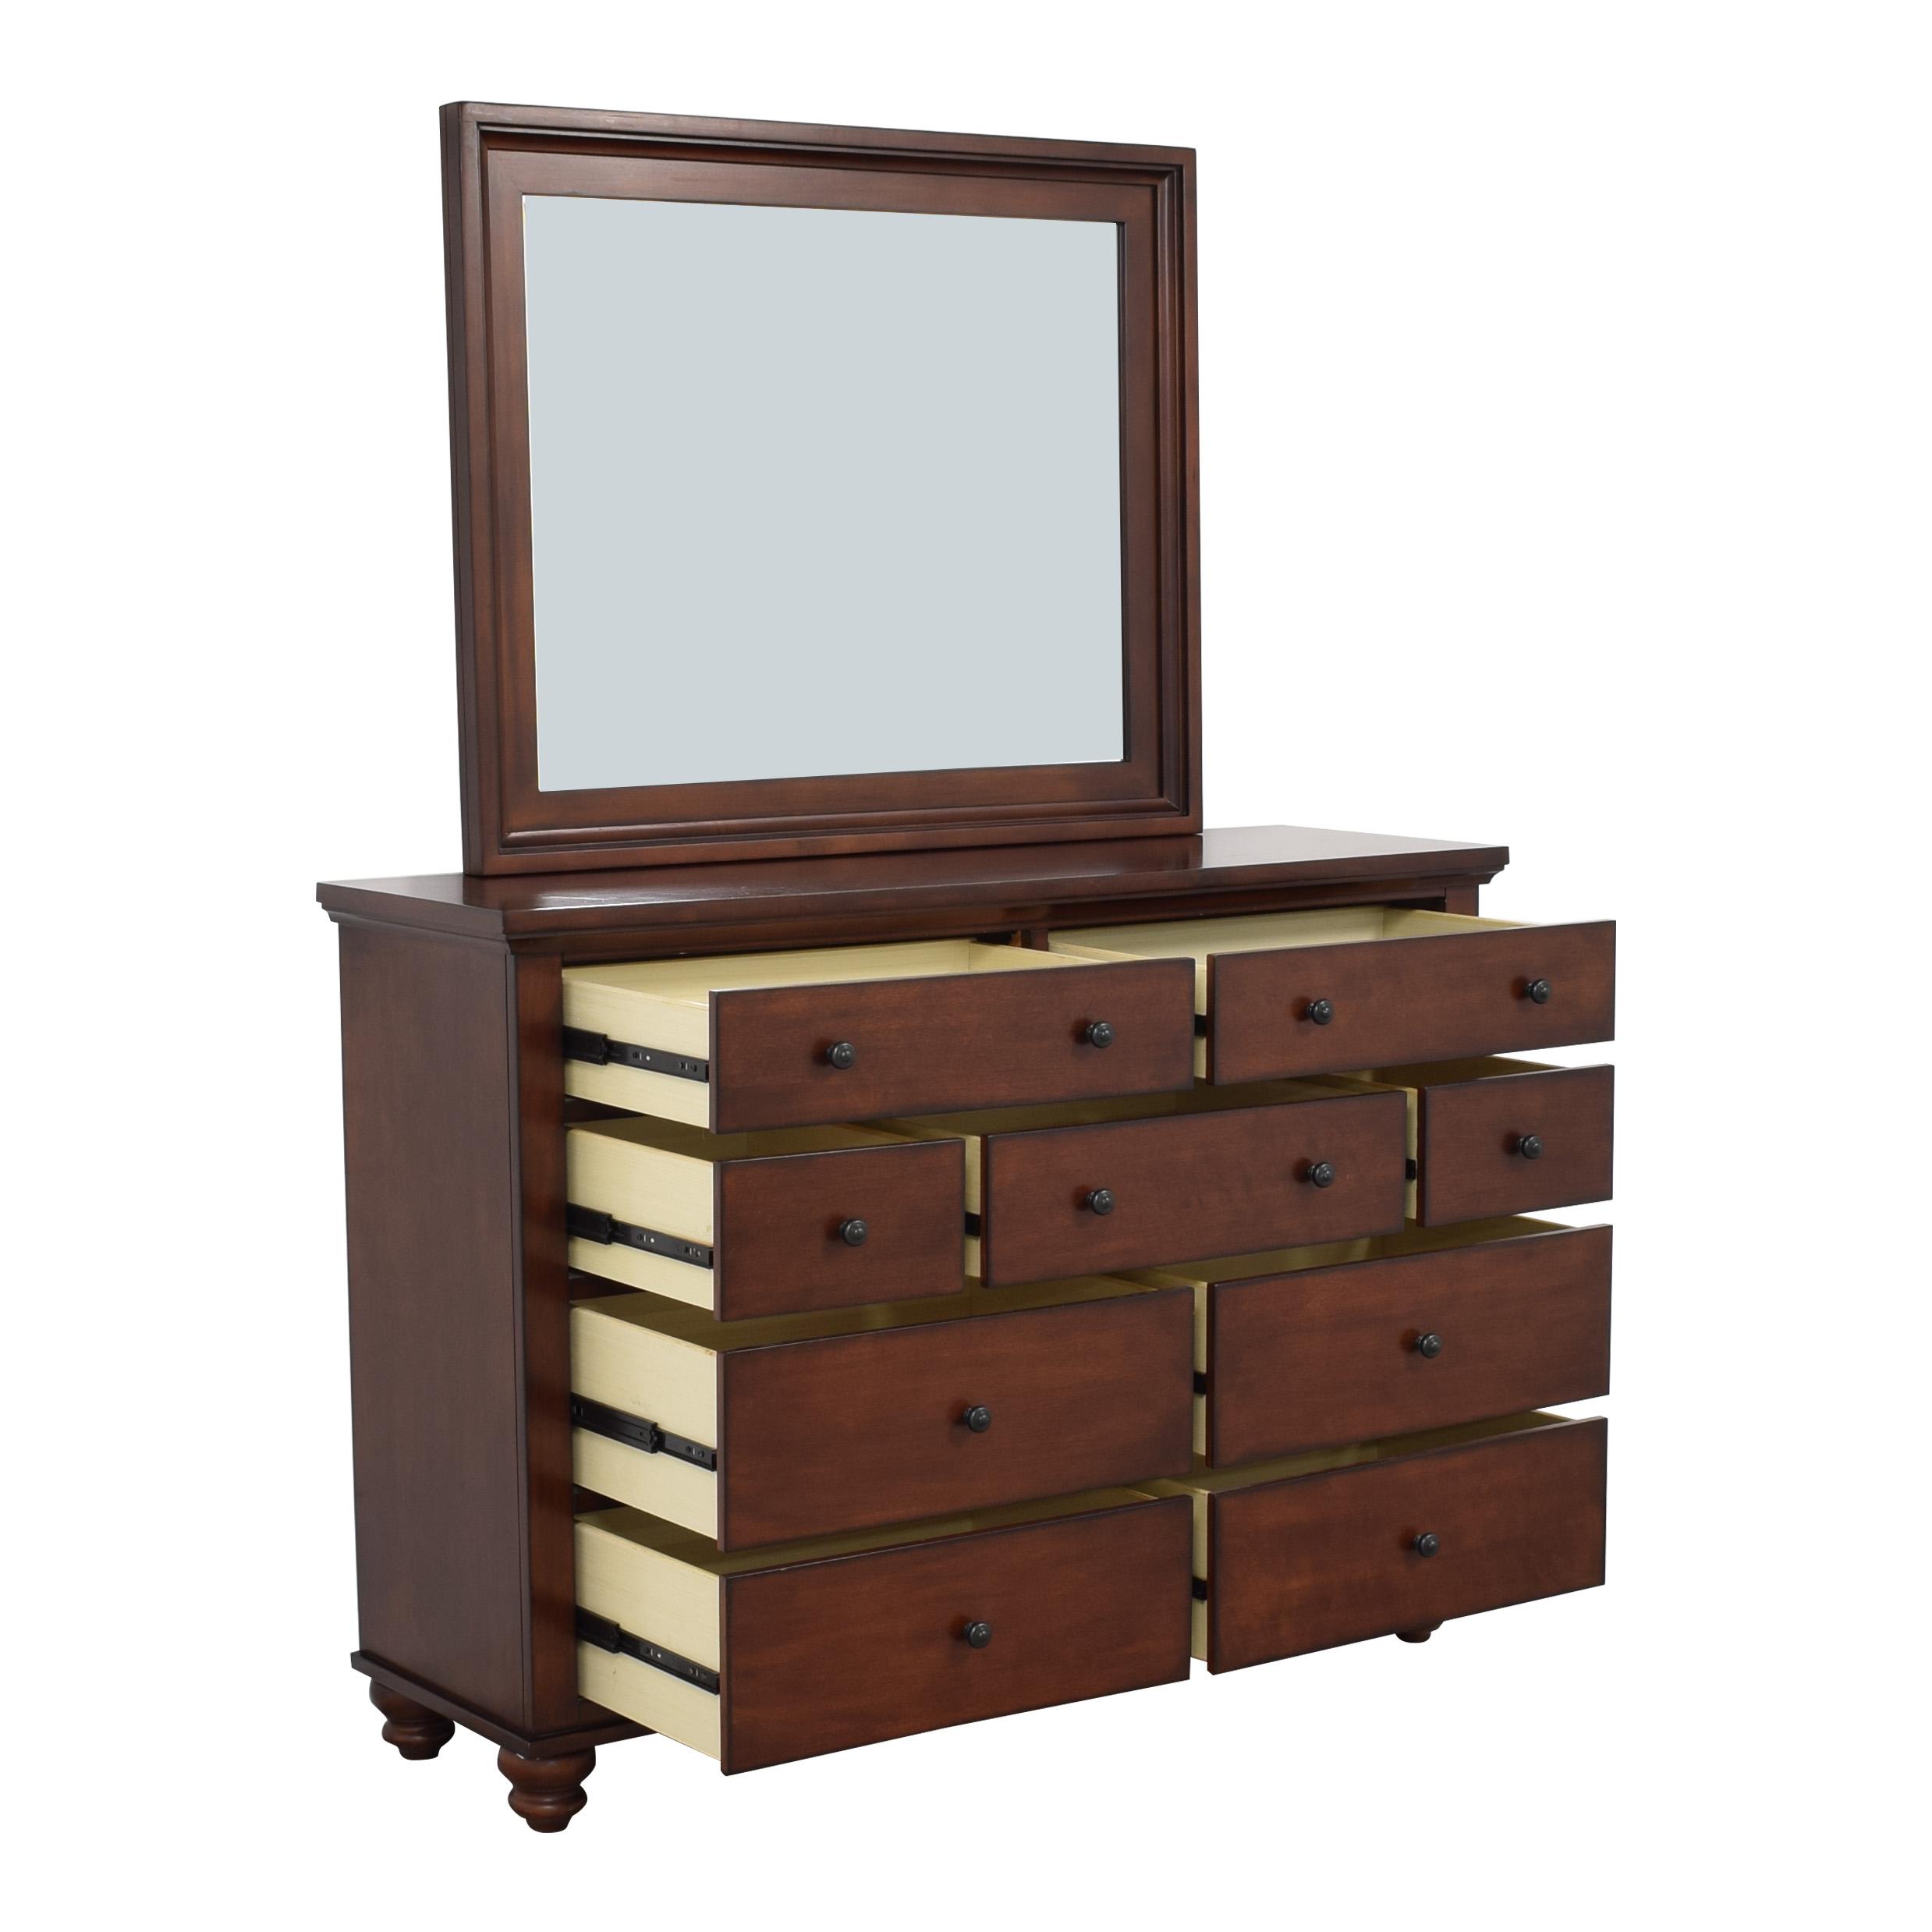 aspenhome Aspen Home Cambridge Dresser with Mirror for sale